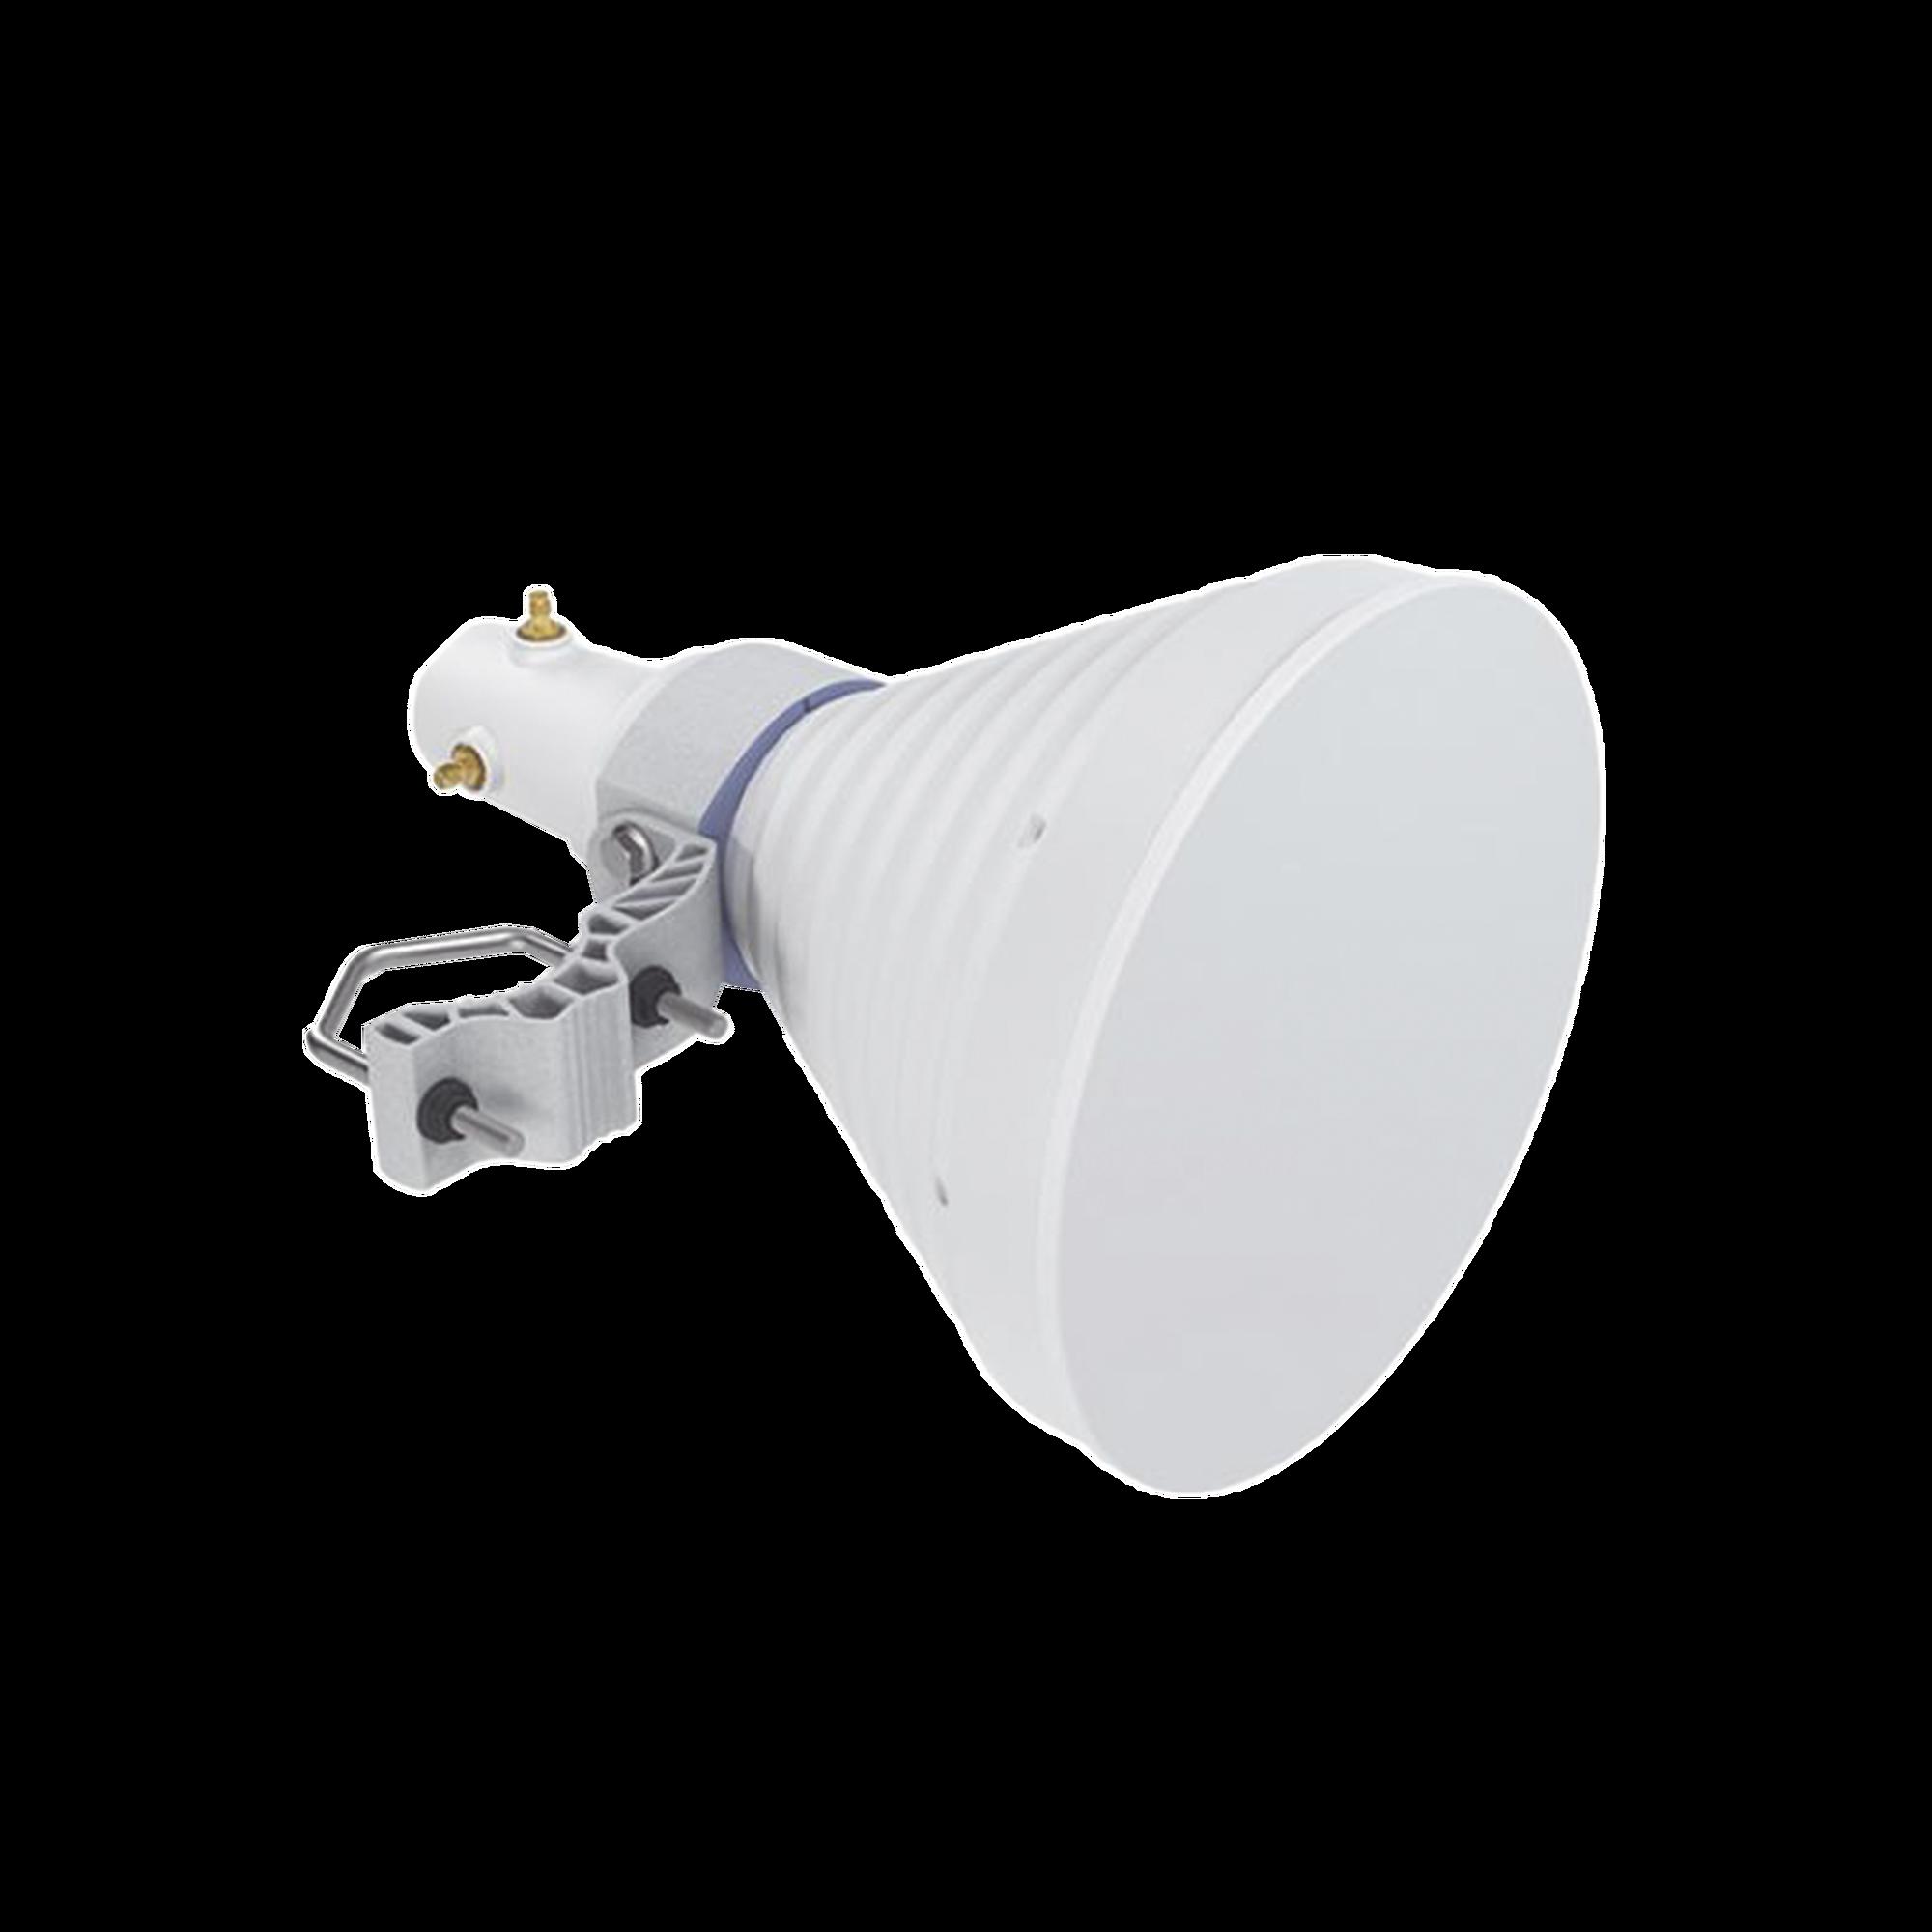 Antena Sectorial Simétrica Starter Horn de 30?, 5150 - 5950 MHz, ganancia de 18 dBi, conexión directa con radios IS-5AC, PS-5AC y IS-M5, conexión RP-SMA